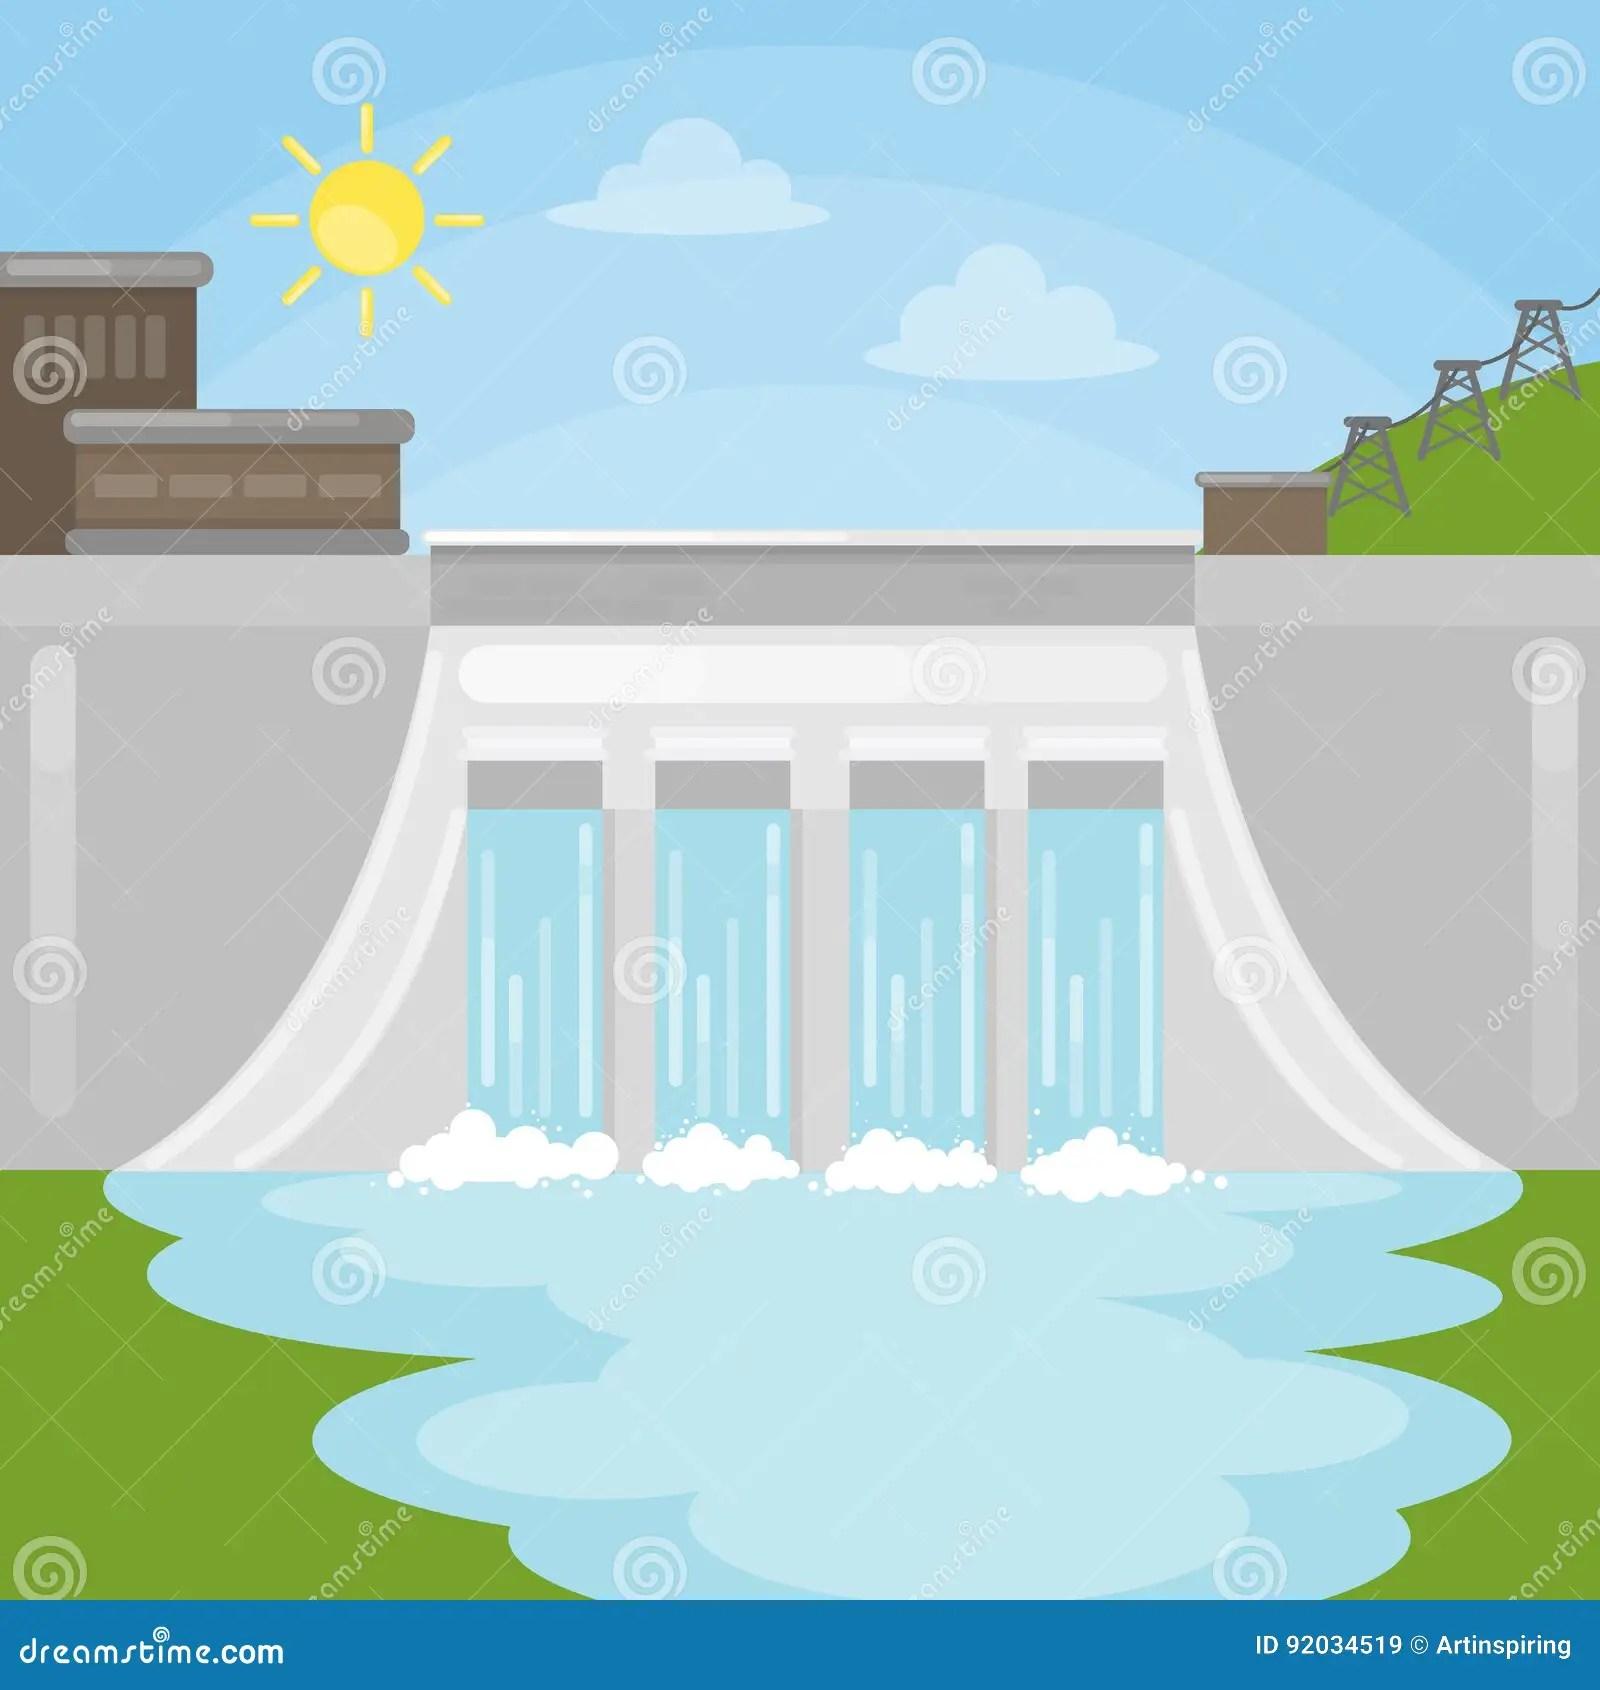 Dam Cartoons Illustrations Amp Vector Stock Images